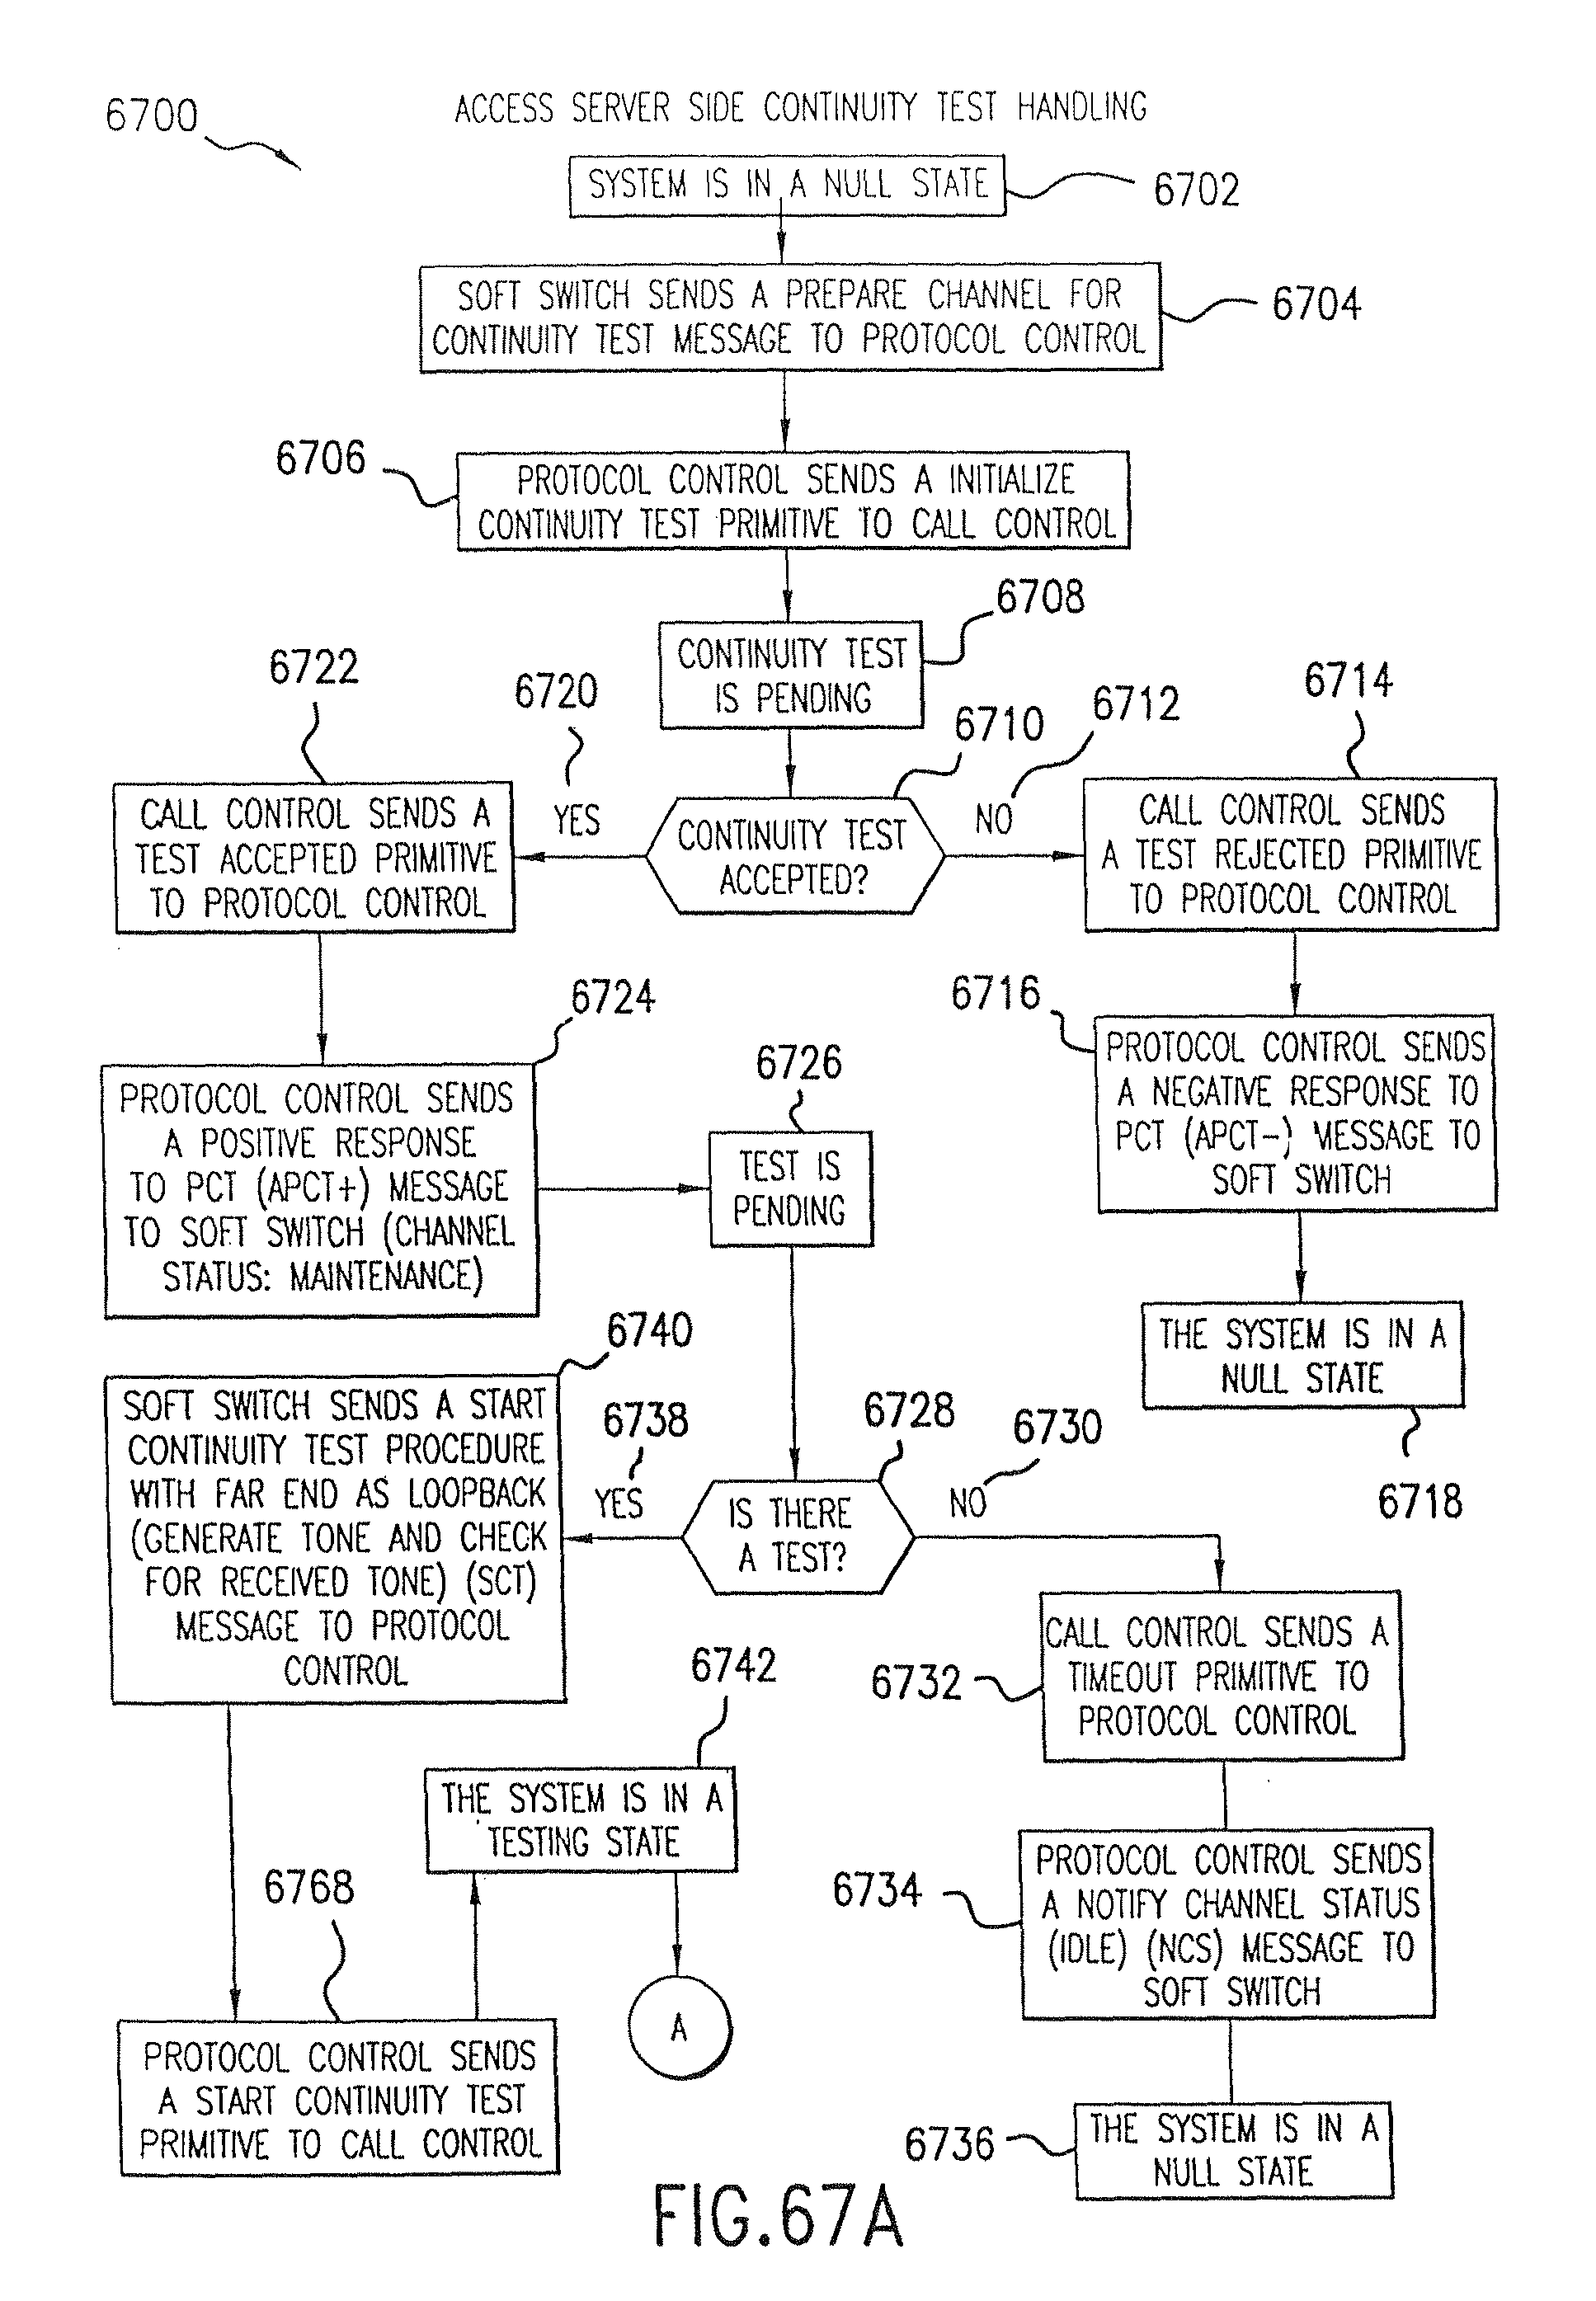 Patent US 8,085,761 B2